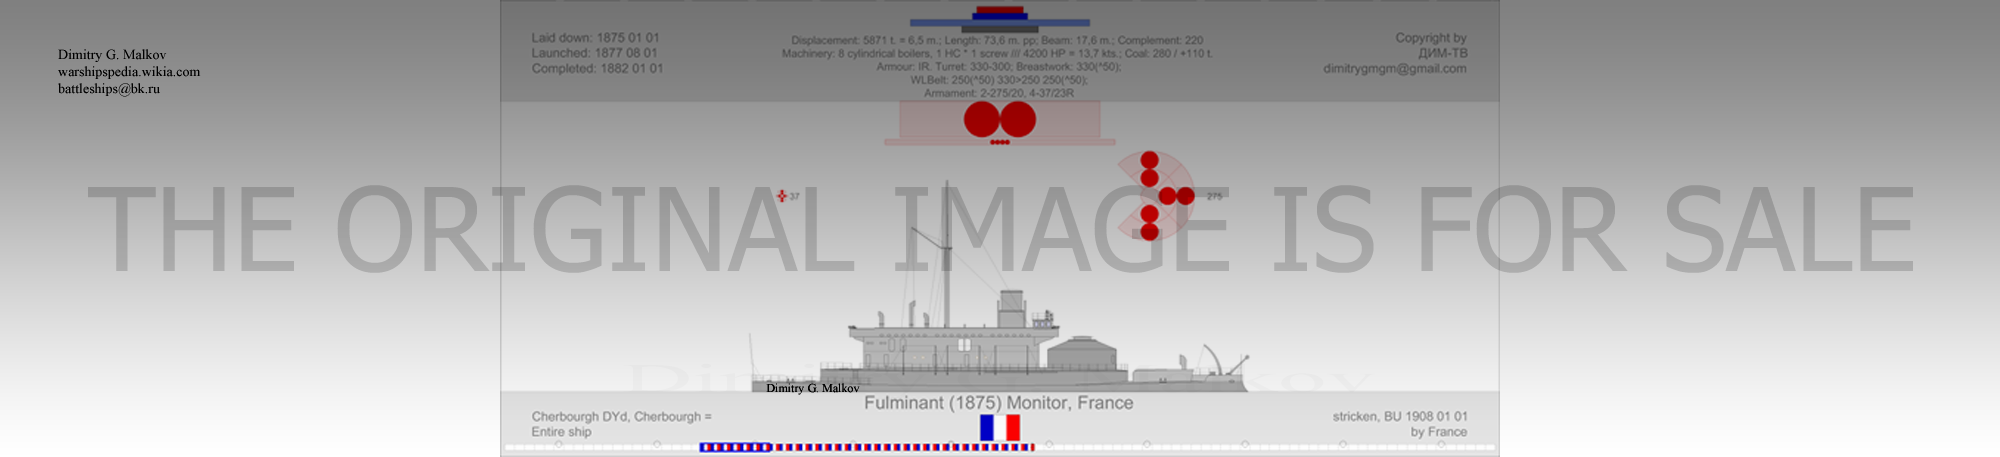 Mes dessins de navires français et de construction française Bm-18711